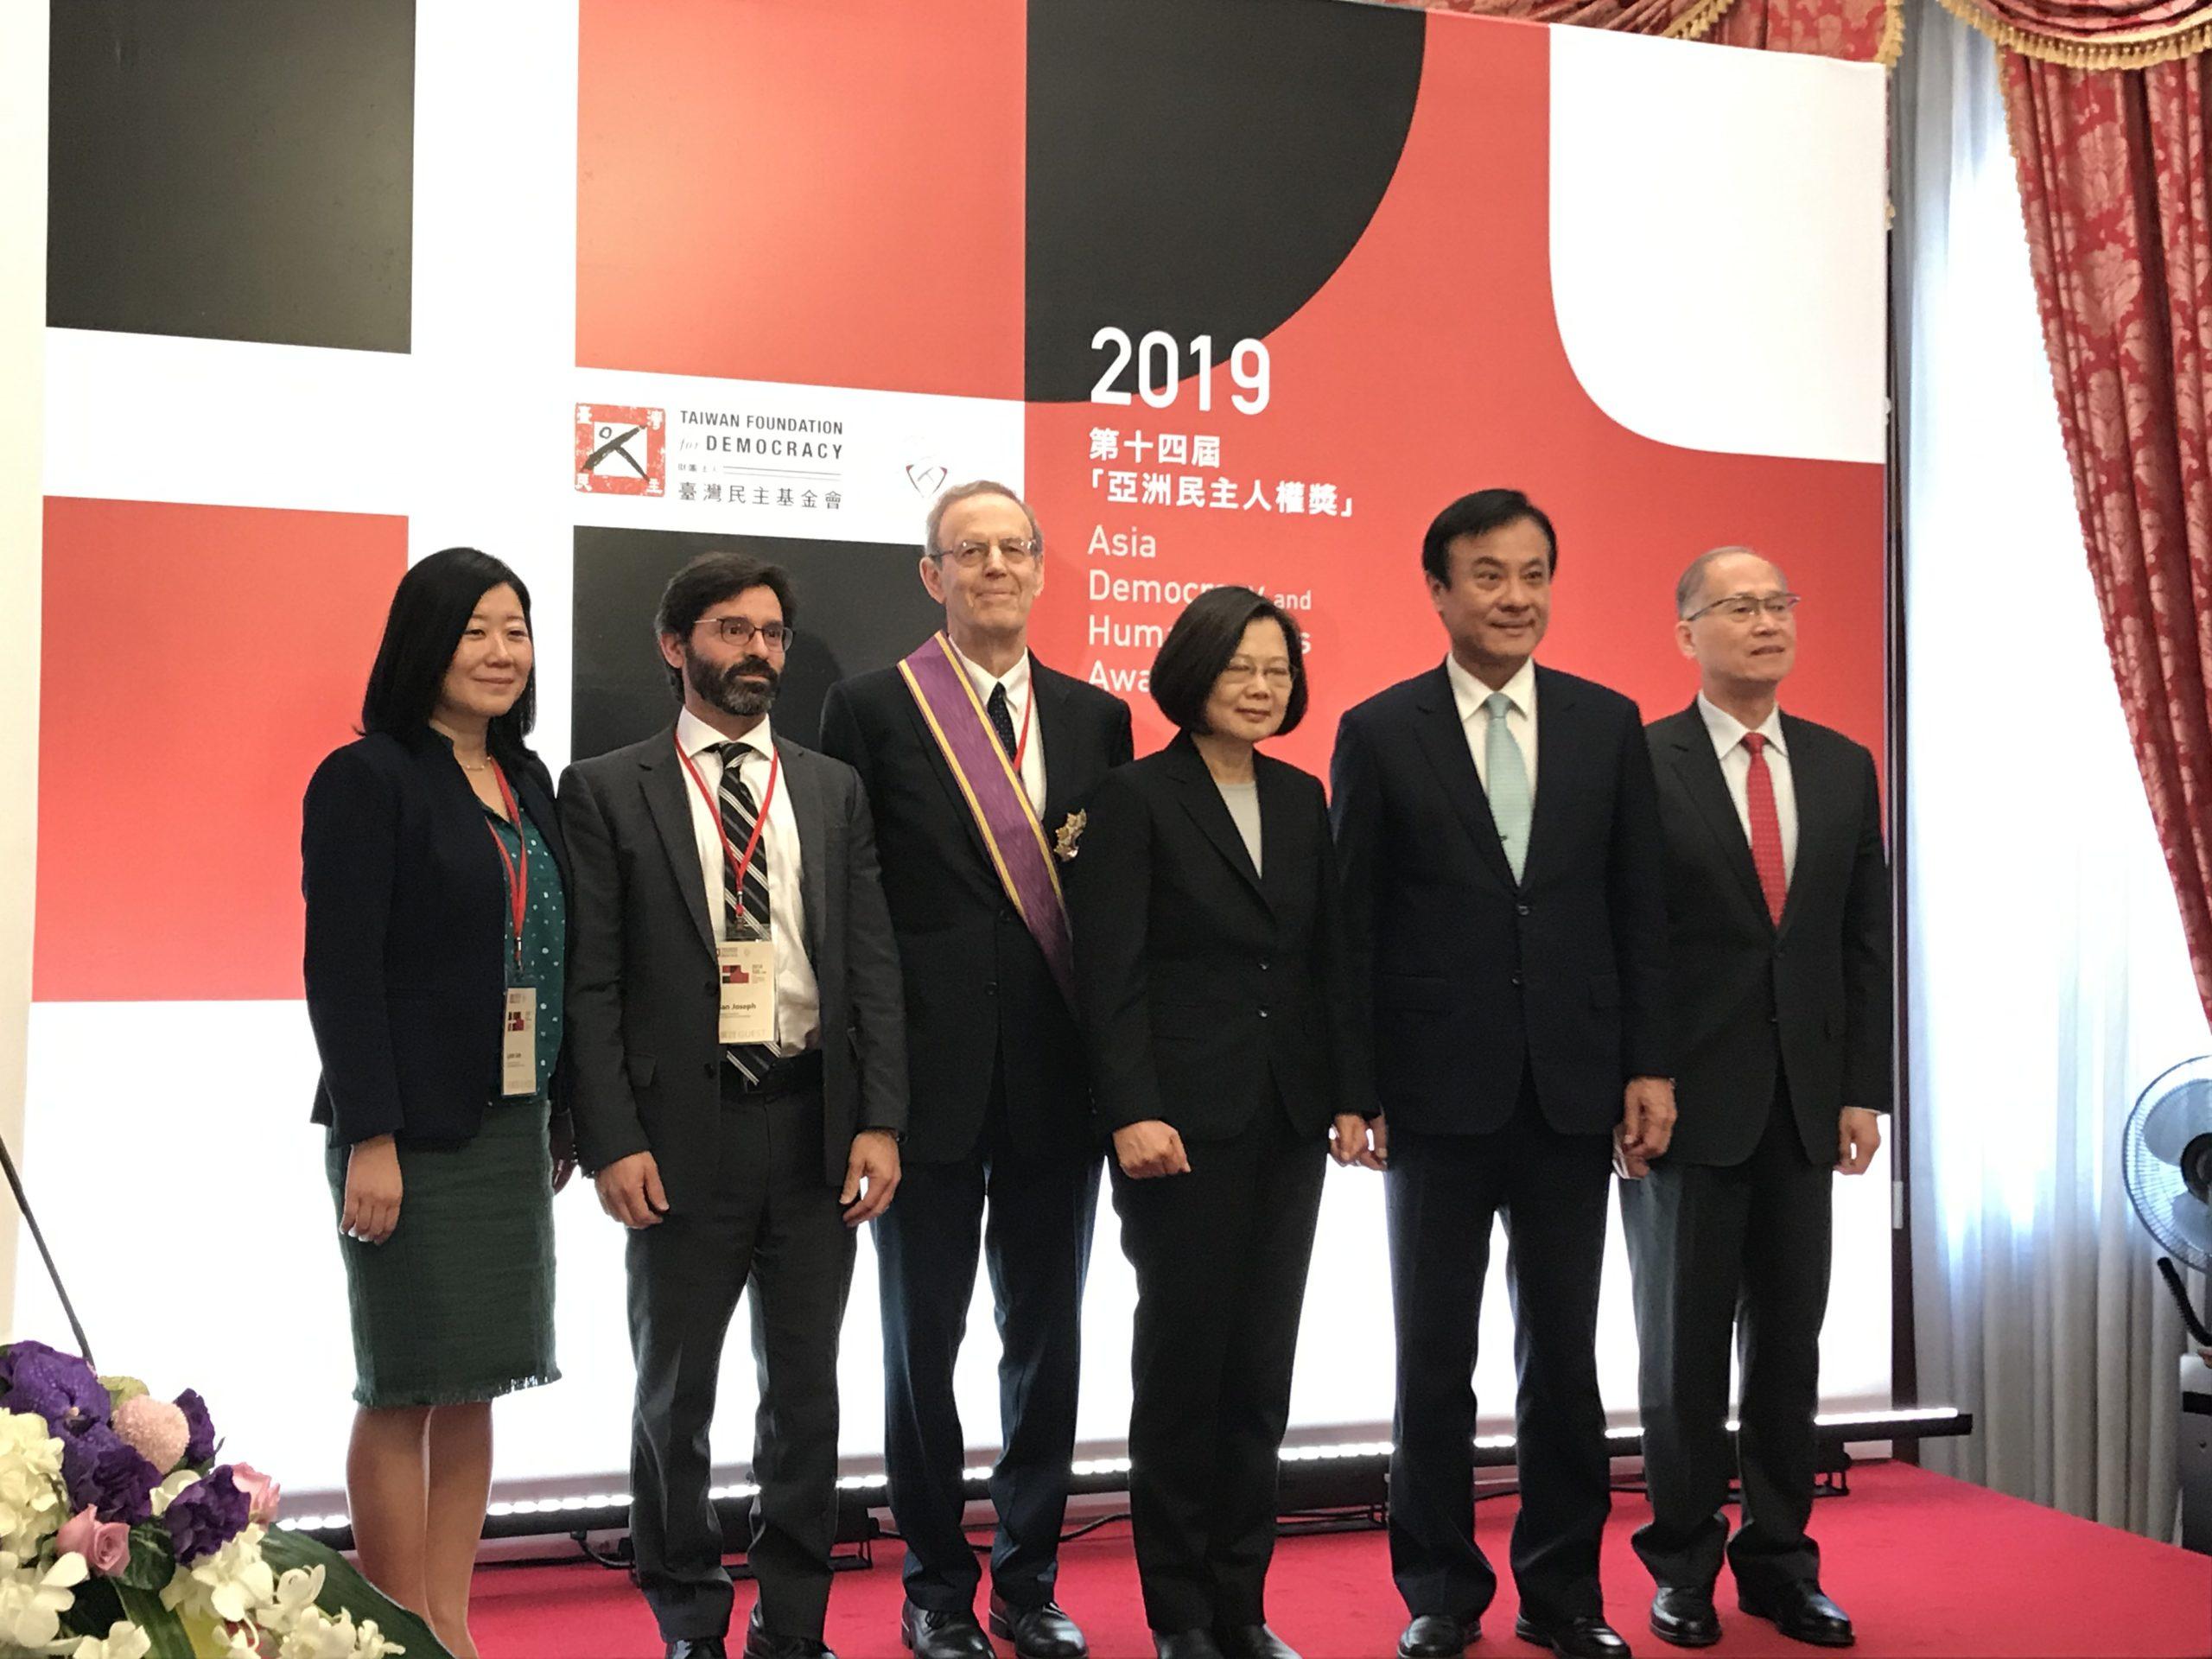 Carl Gershman accepts award from Taiwanese President